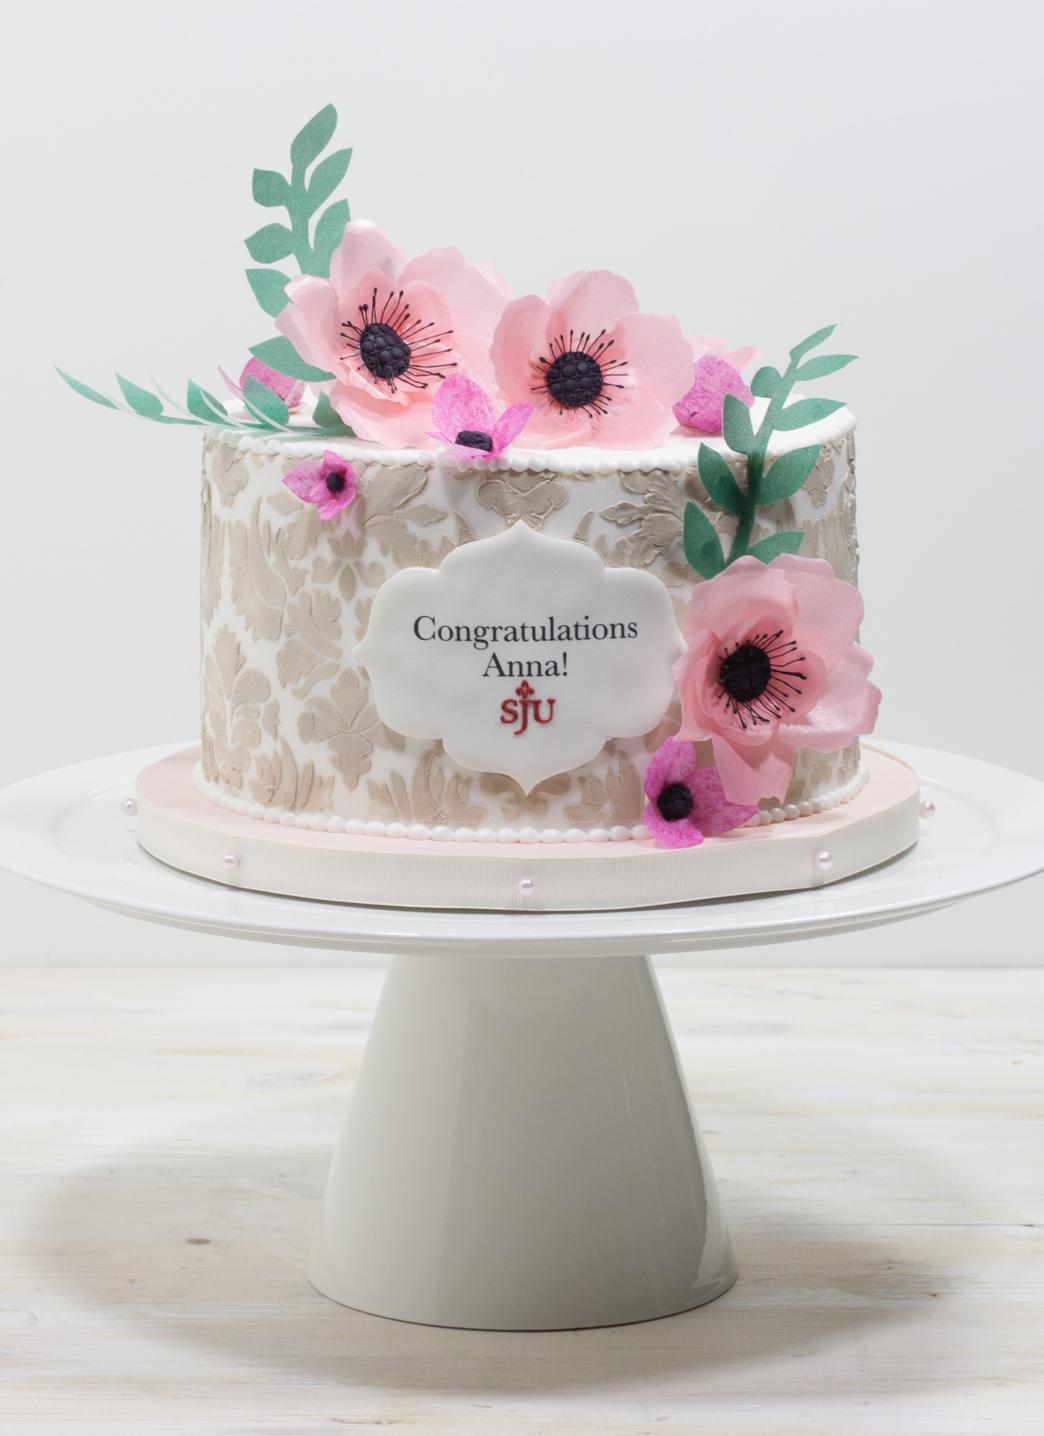 wafer-paper-damask-graduation-cake-whipped-bakeshop-main